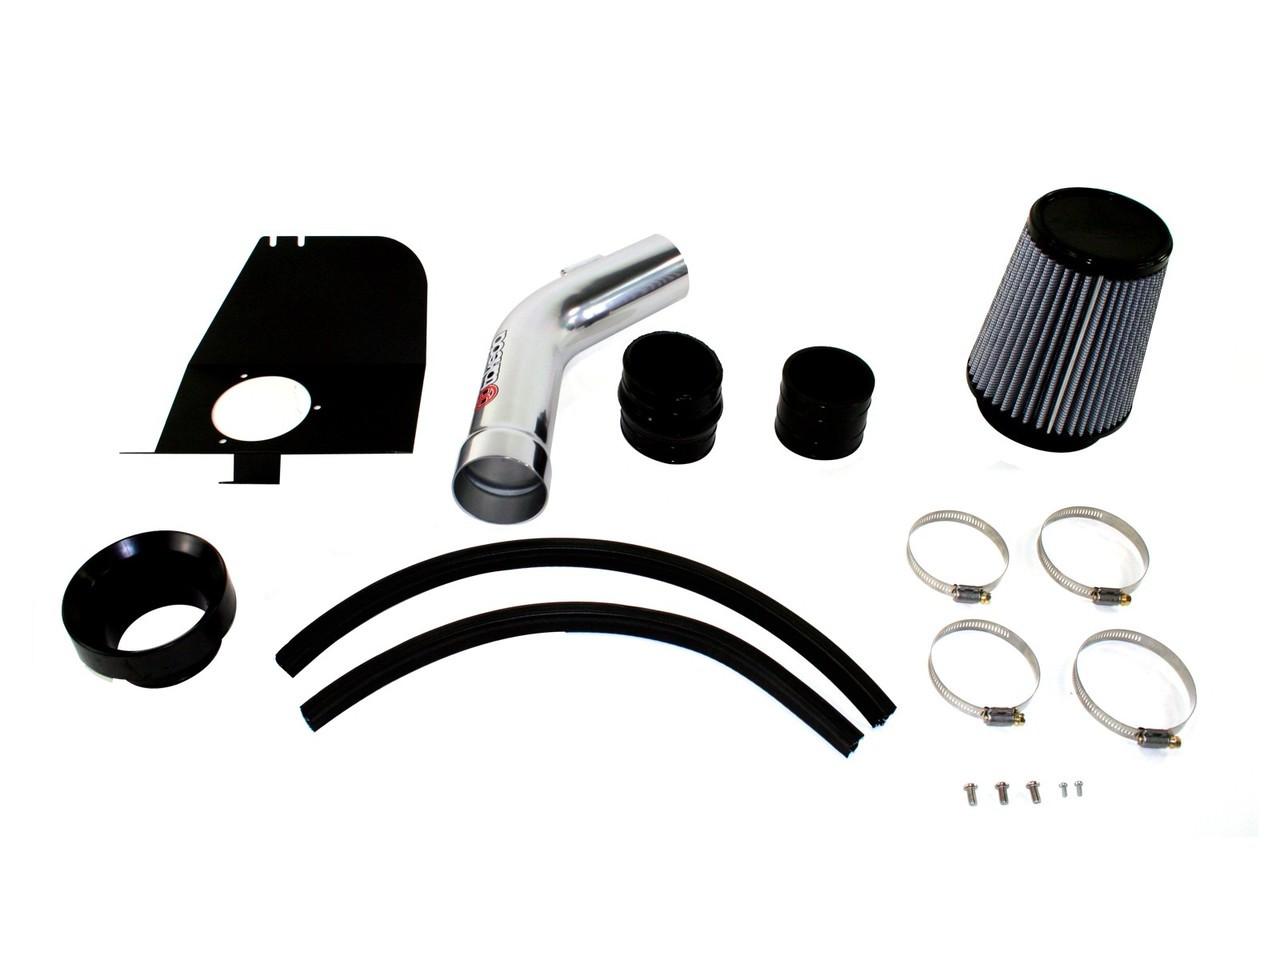 aFe Power TA-4301P Takeda Stage-2 Pro DRY S Cold Air Intake System 08-14 Subaru WRX/STI H4-2.5L